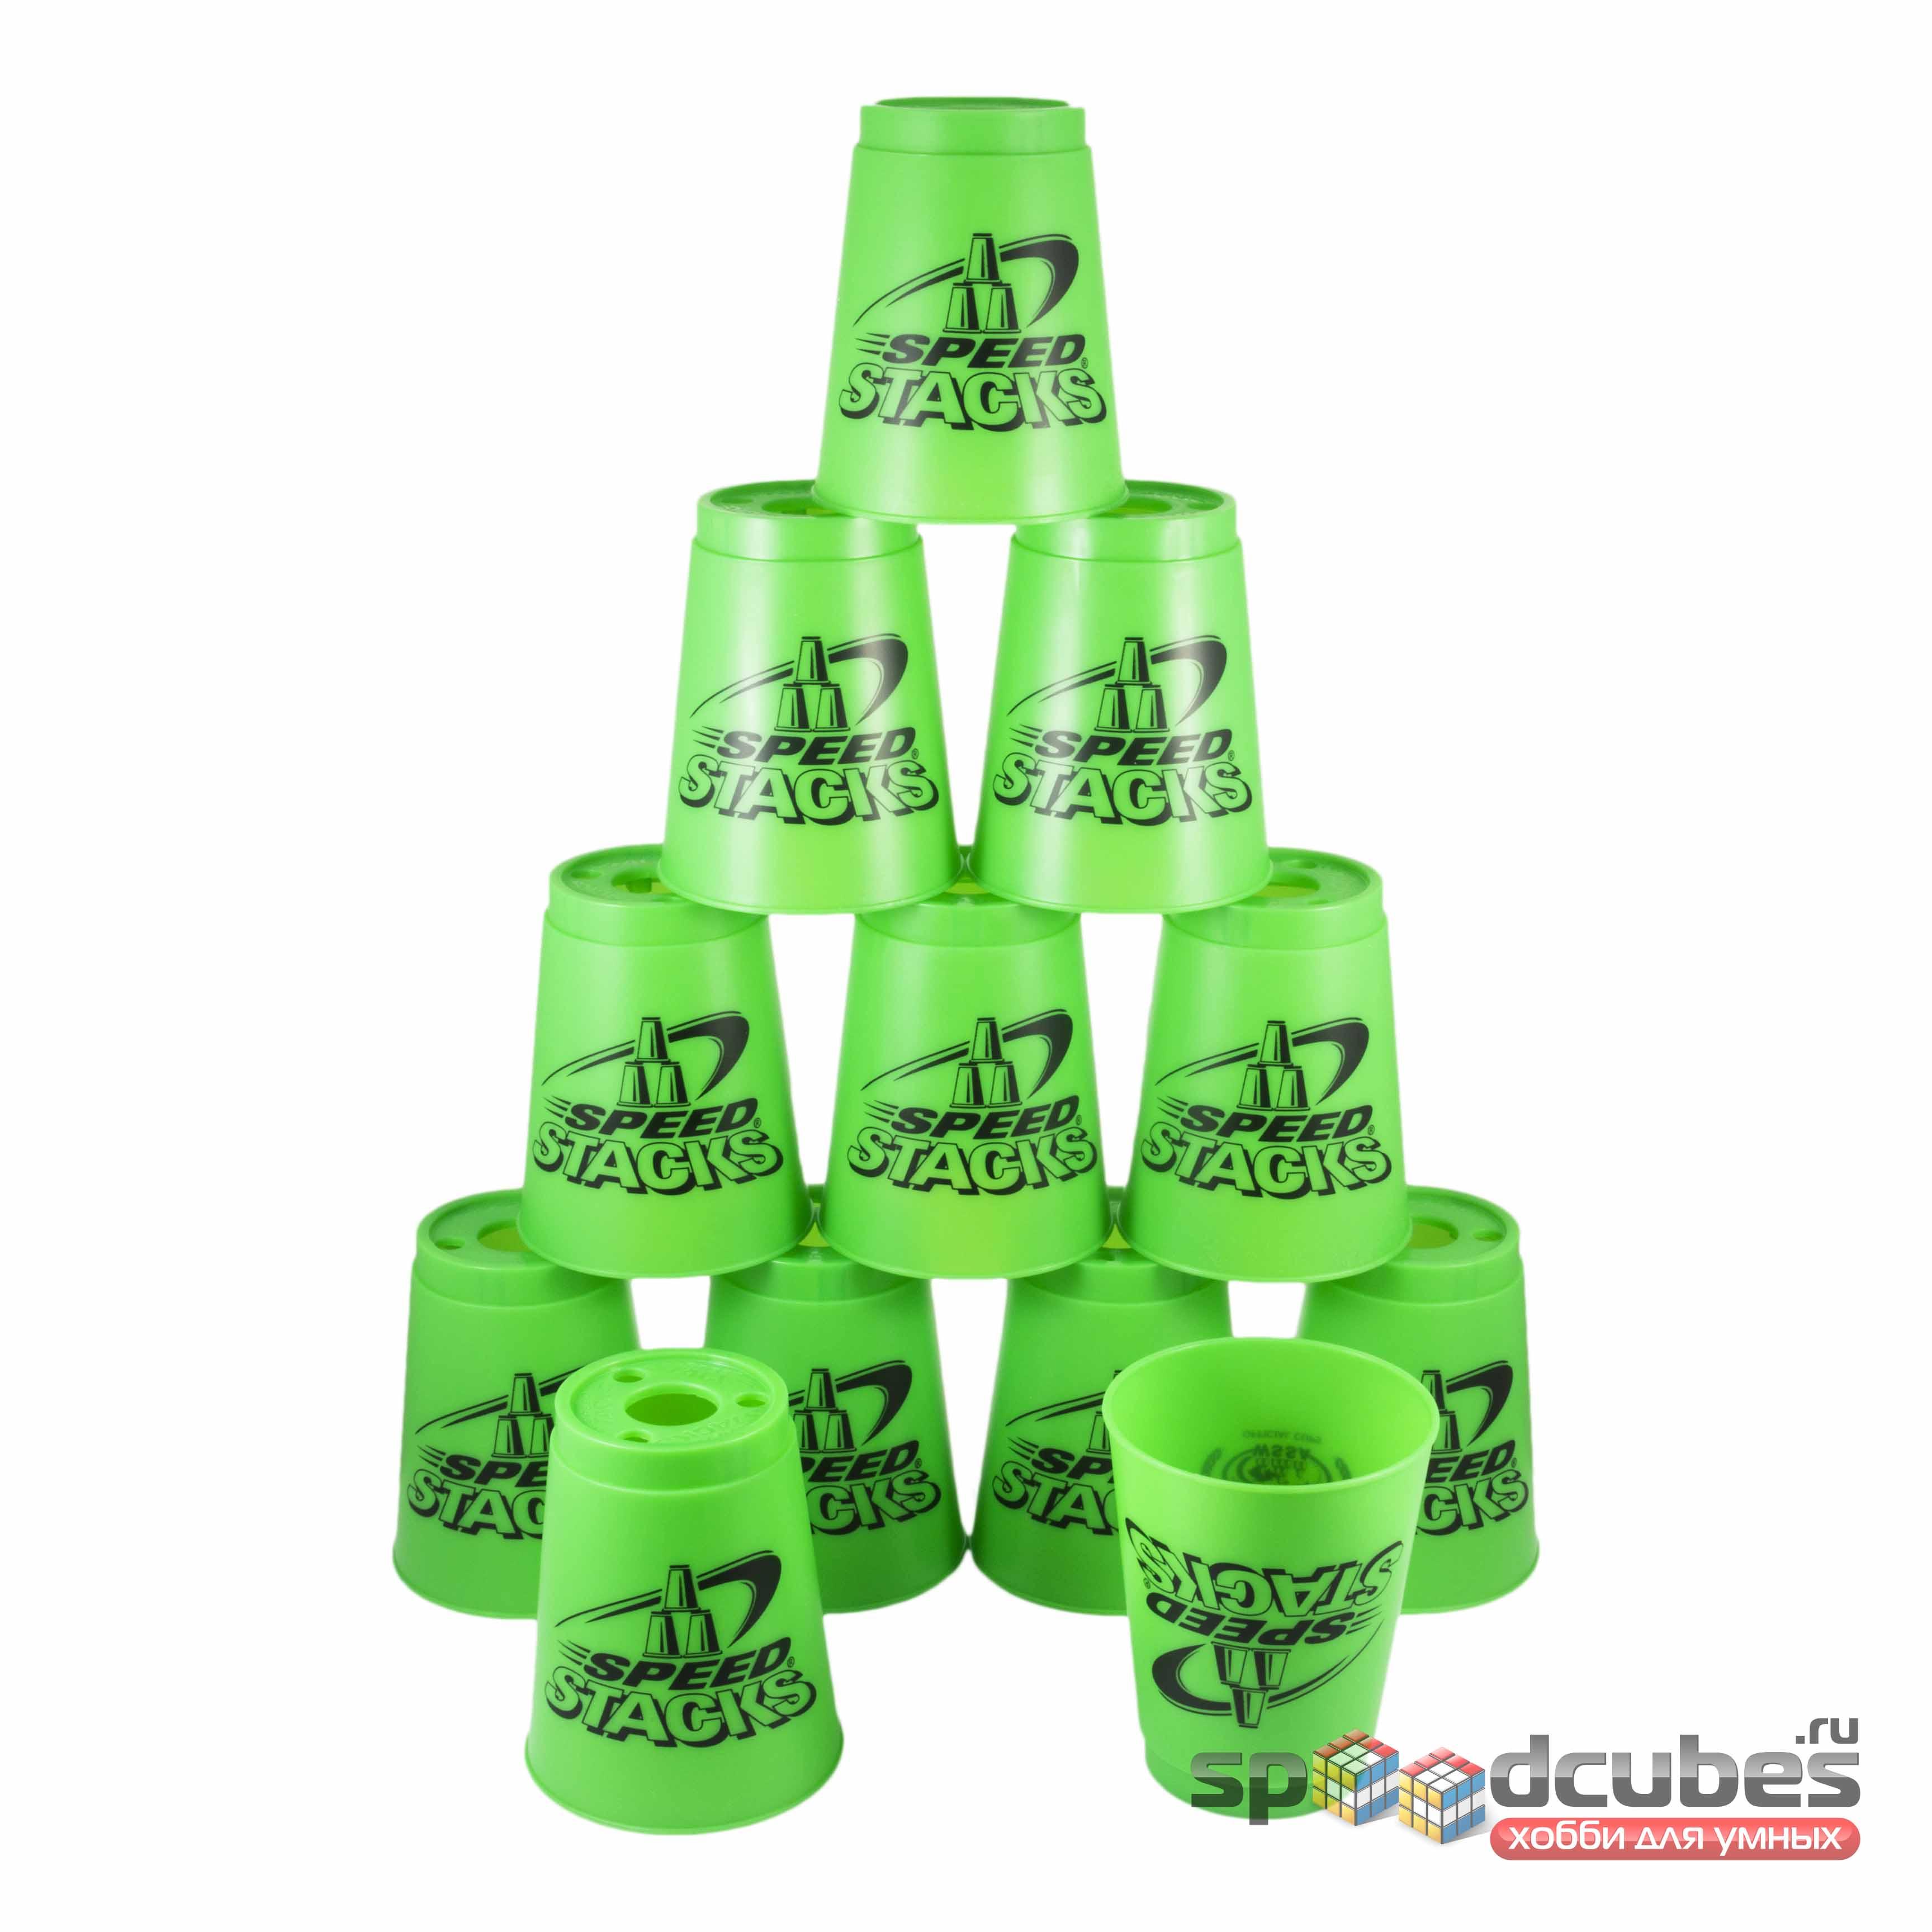 Speed Stacks стаканы для спидстакинга 4